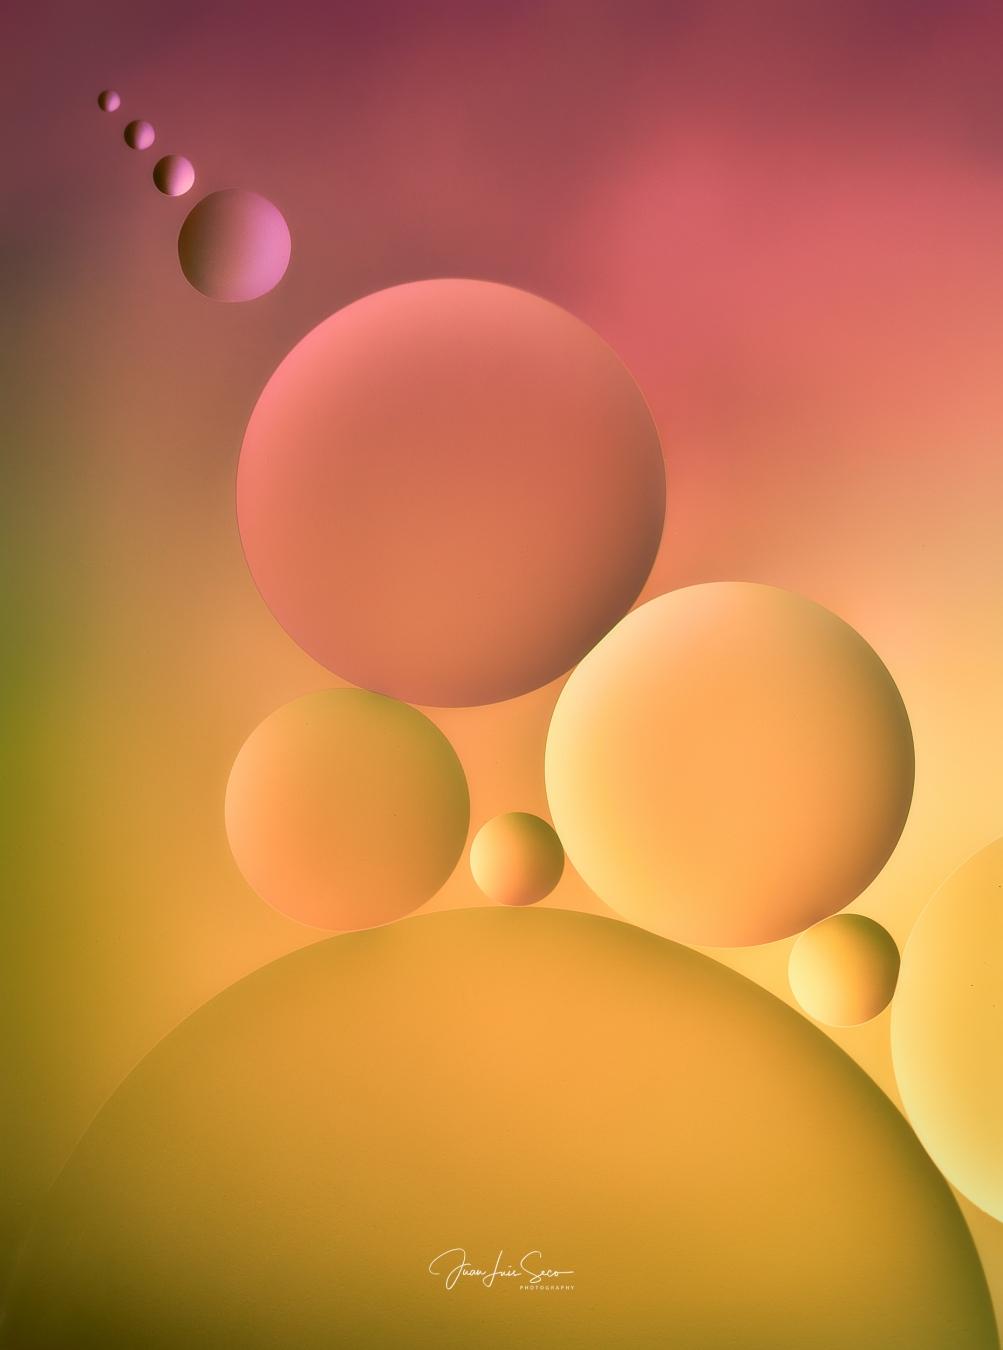 Abstractos - Juan Luis Secø, Fotografia